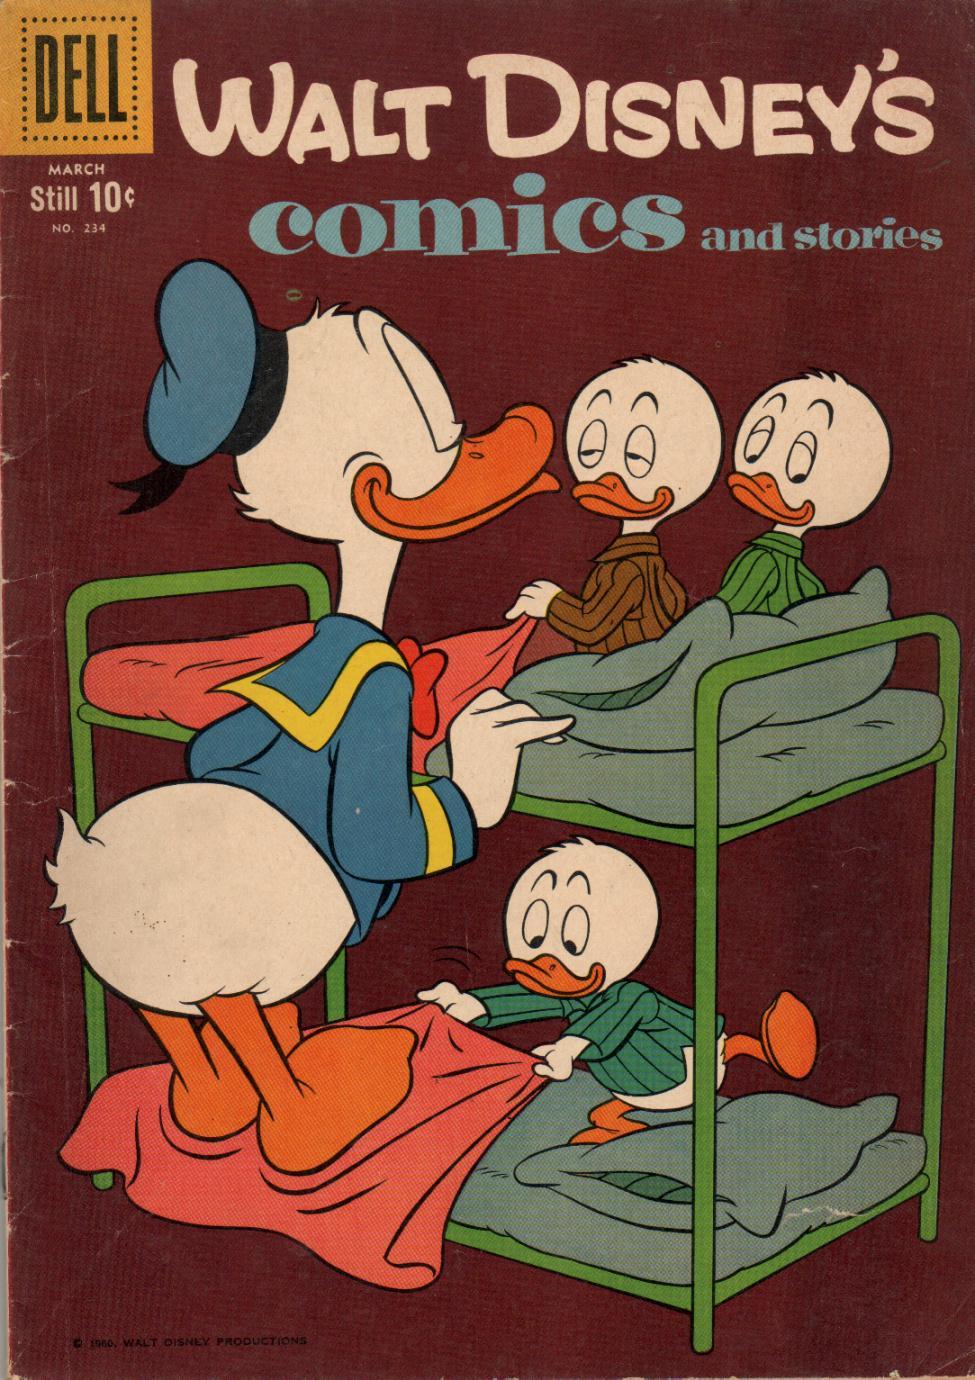 Walt Disneys Comics and Stories 234 Page 1